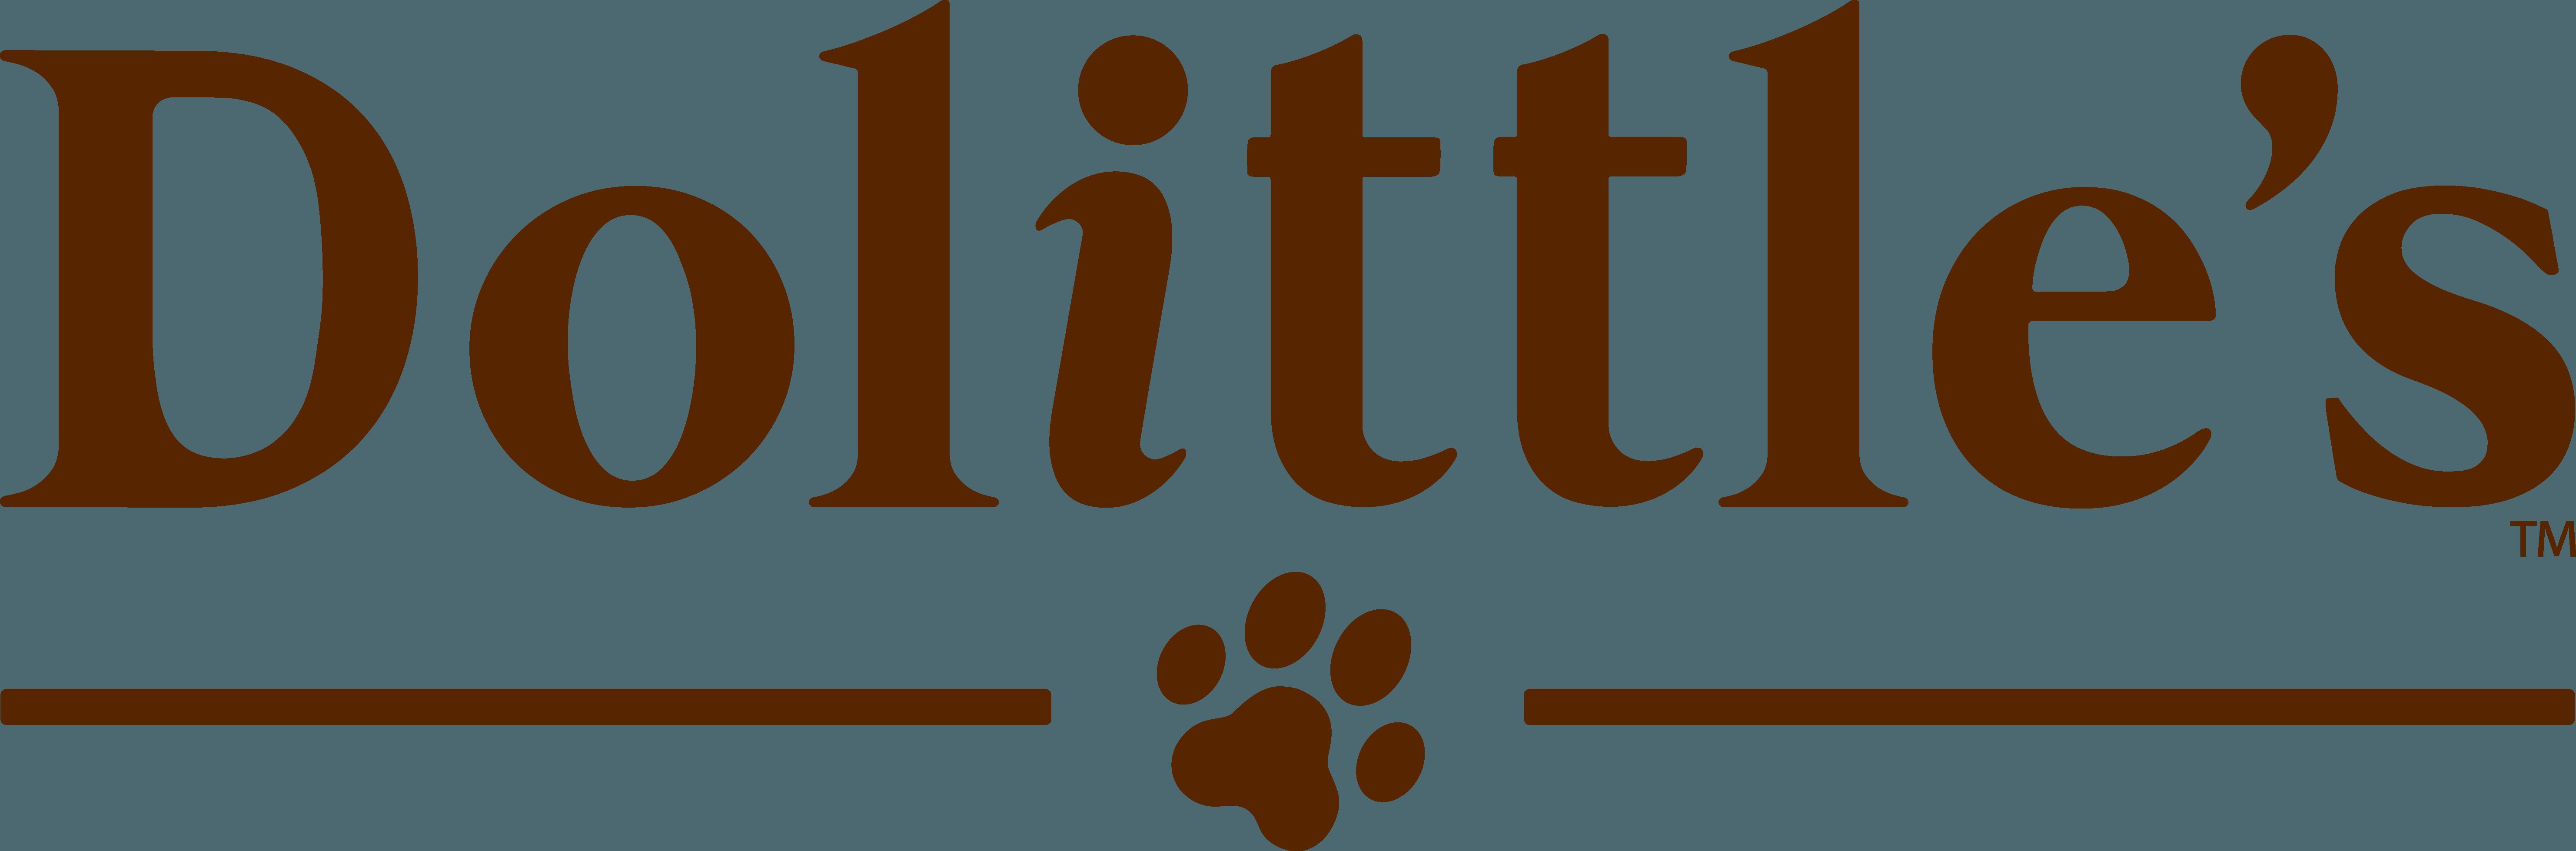 Dog wash solutioingenieria Choice Image